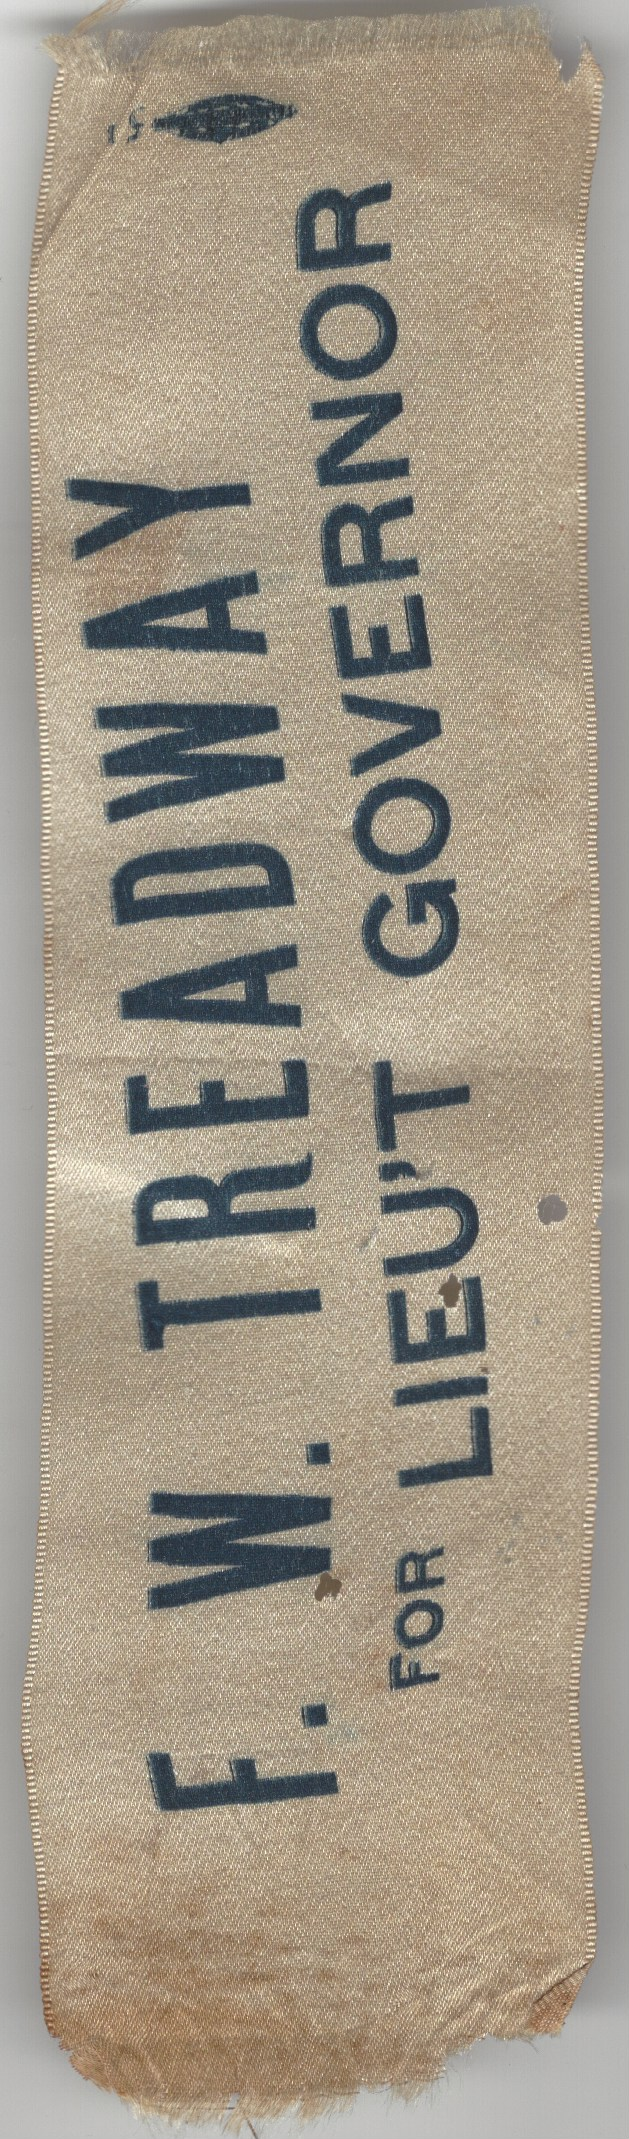 OH1908-LG01 TREADWAY.jpeg